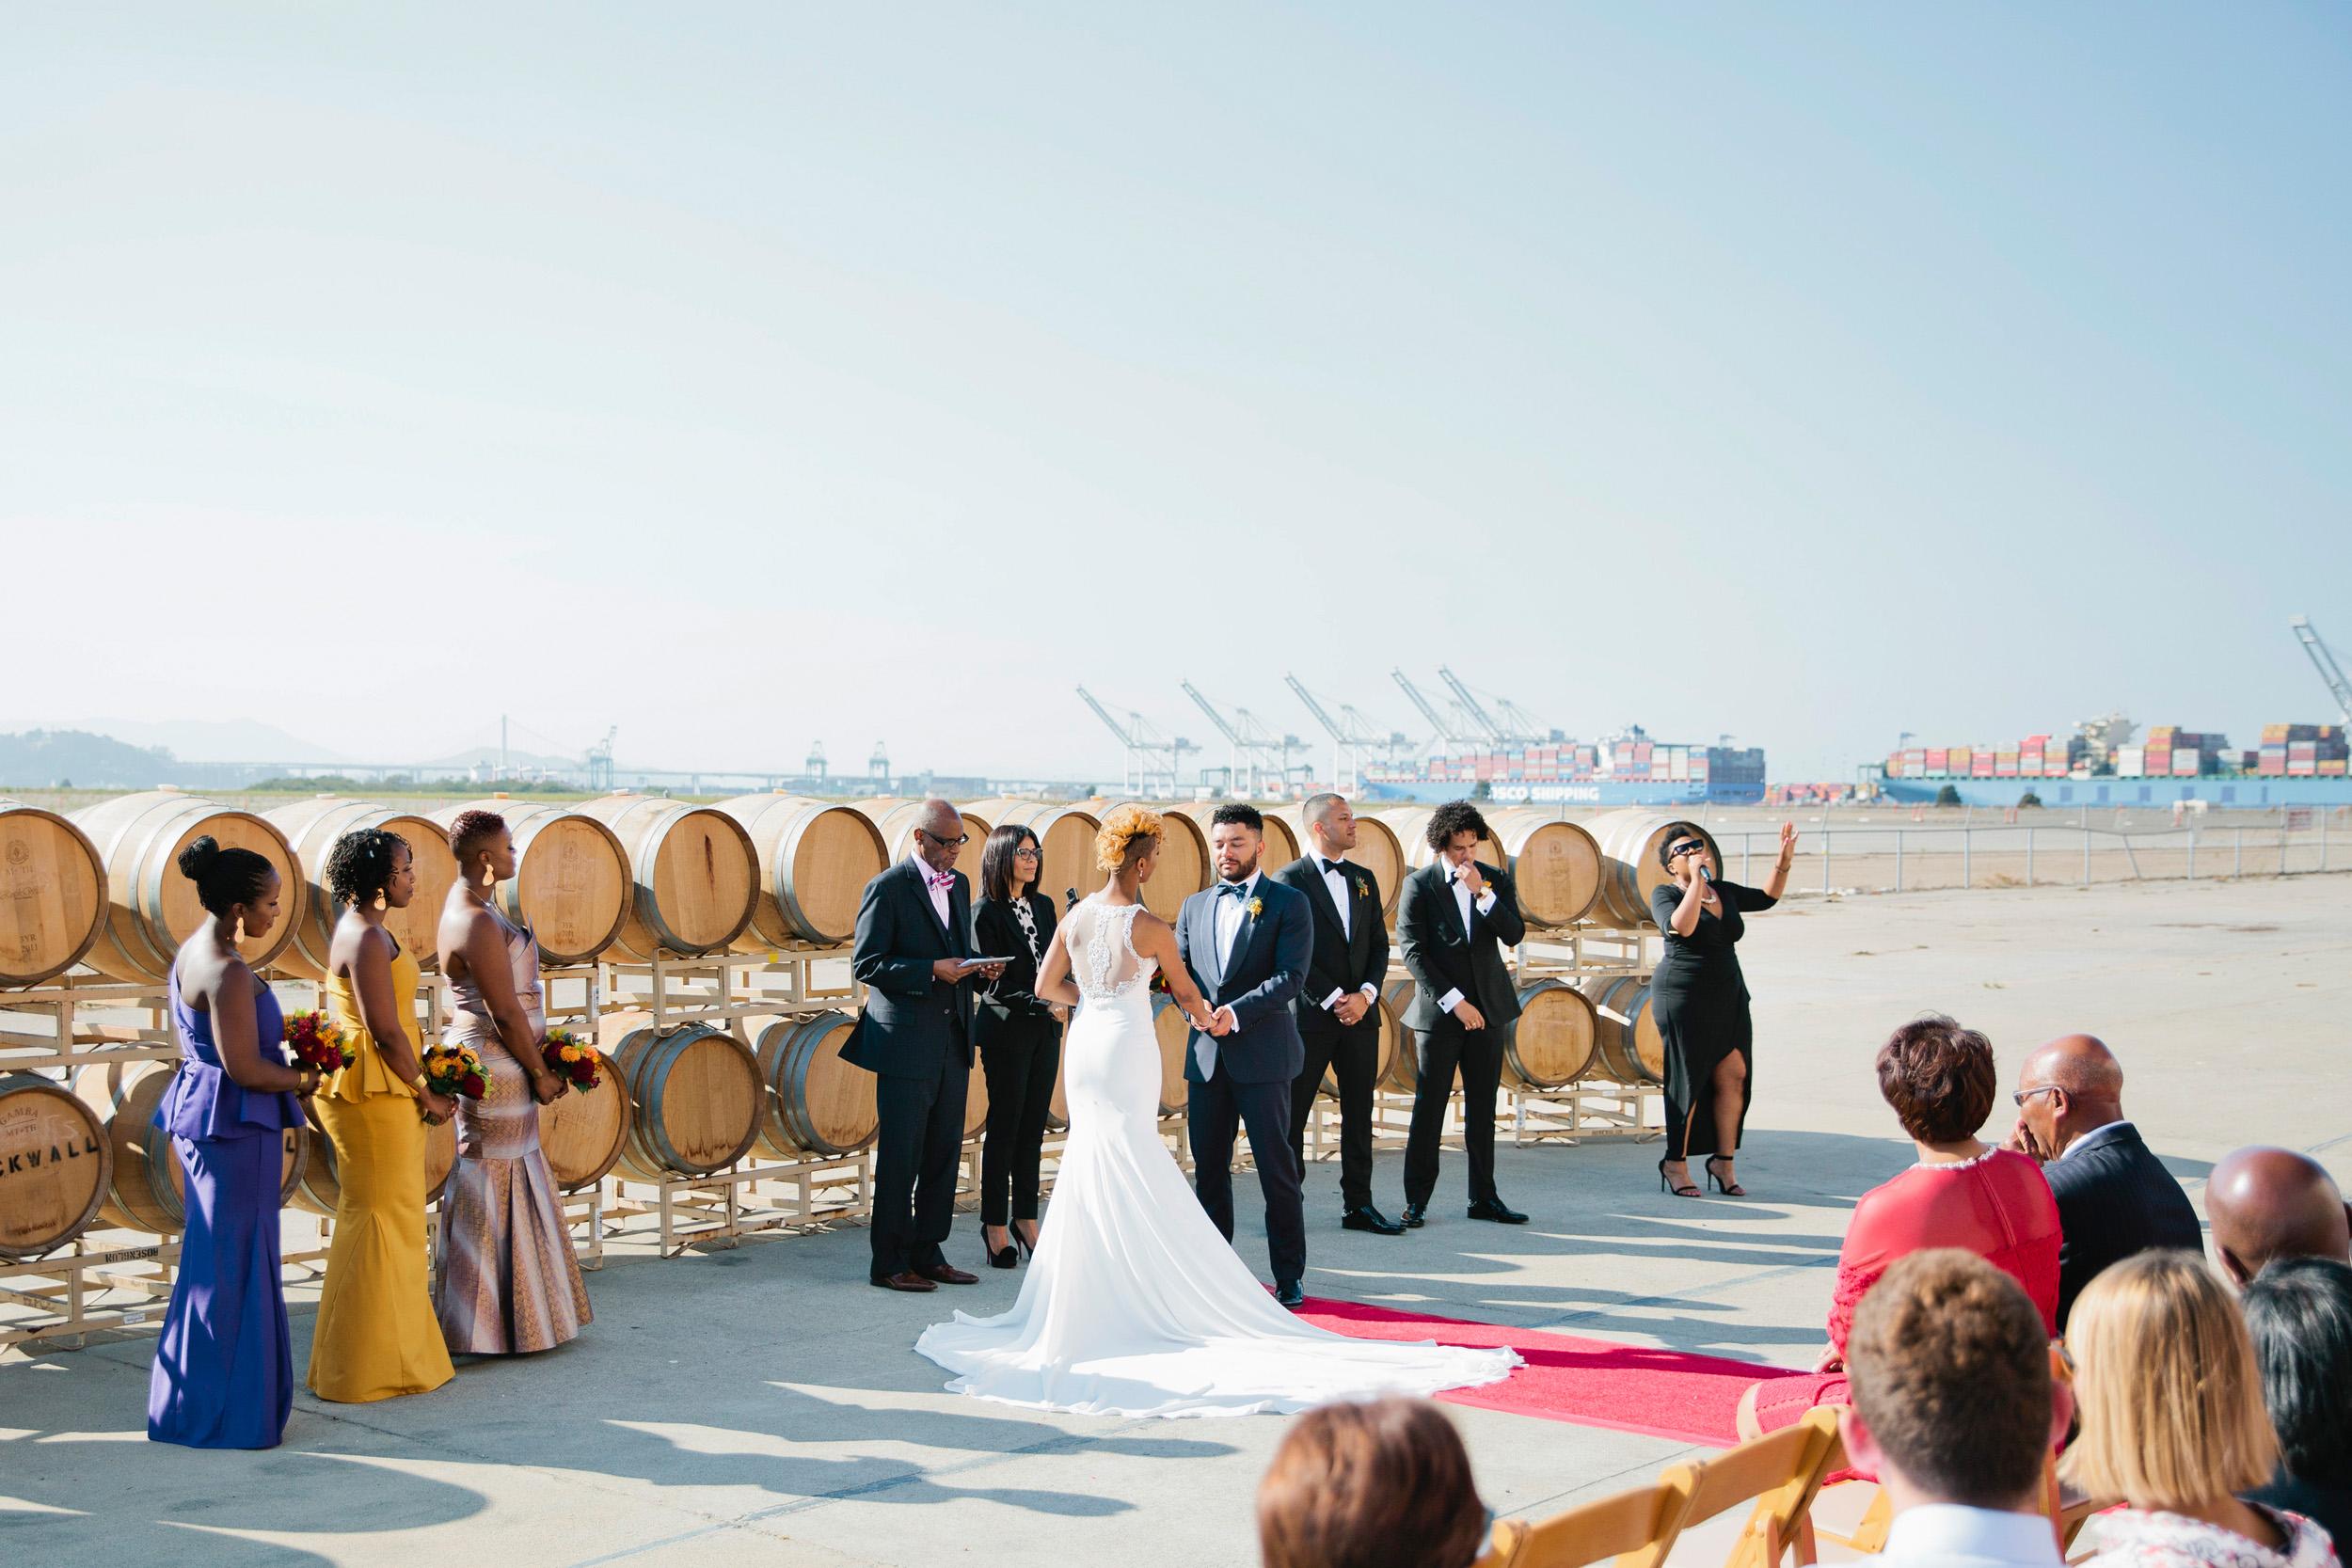 Alameda-Rockwall-Winery-Wedding-031.JPG